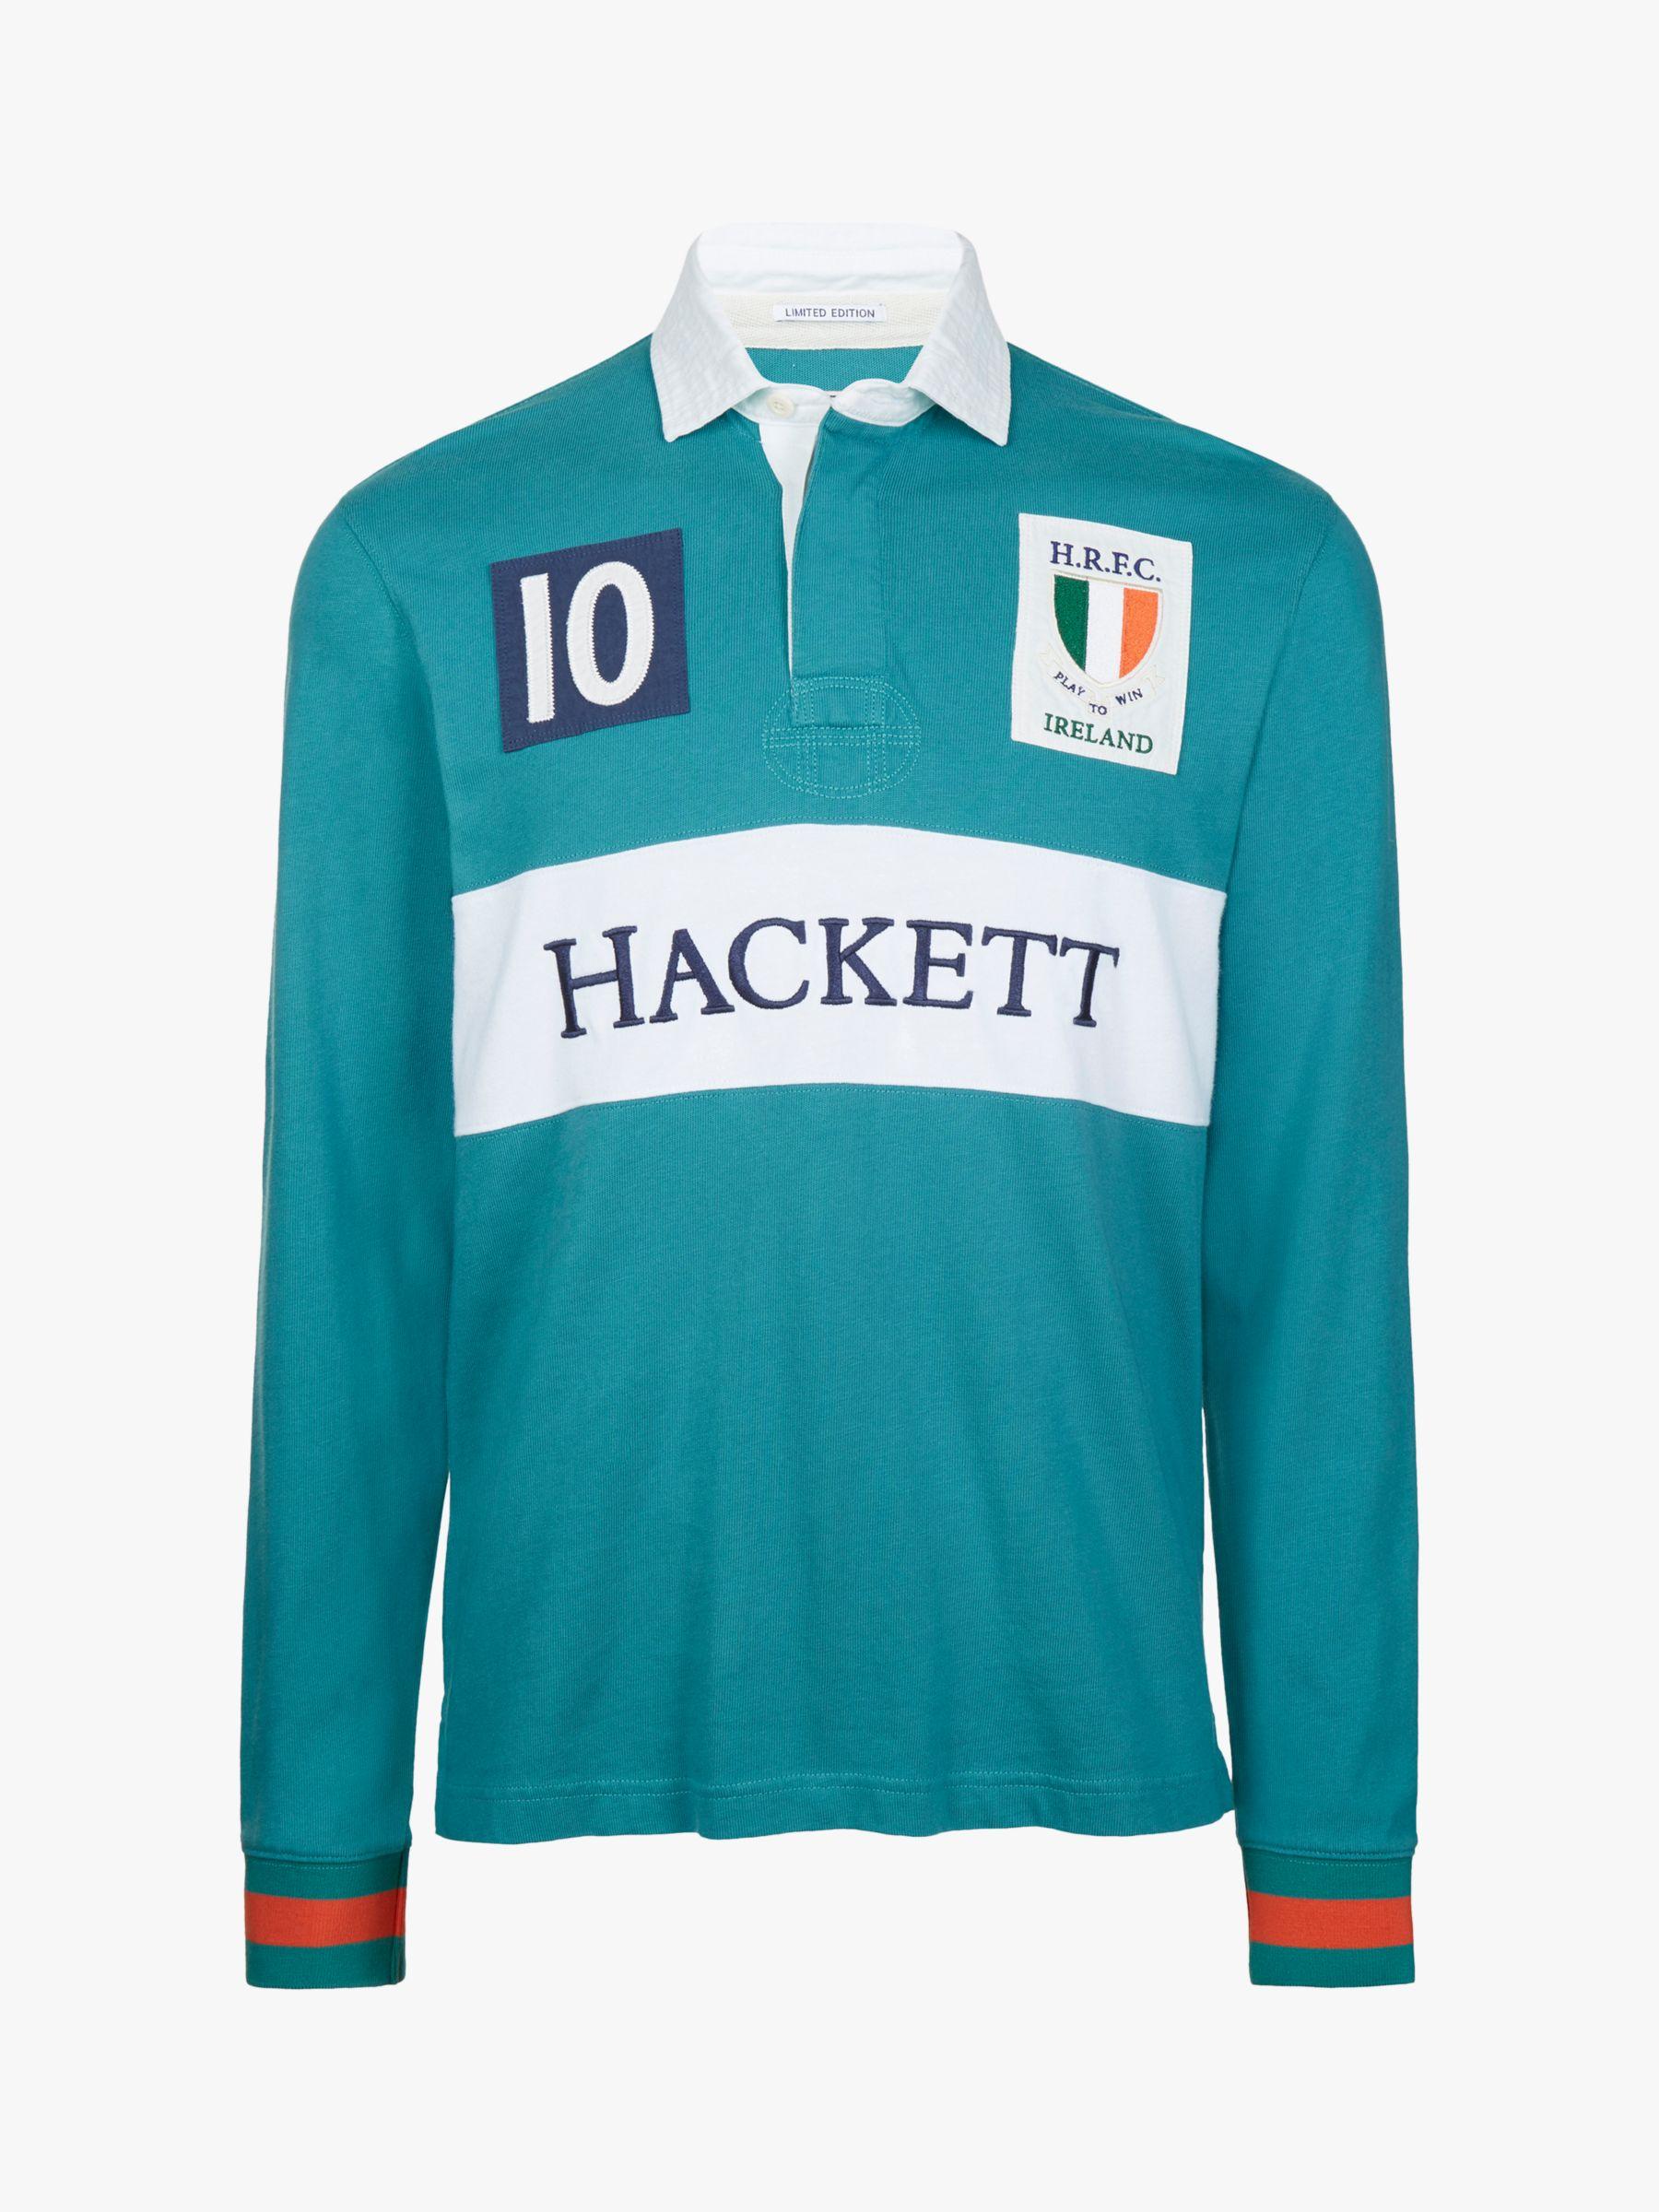 Hackett London Hackett London Ireland Cotton Rugby Shirt, Green